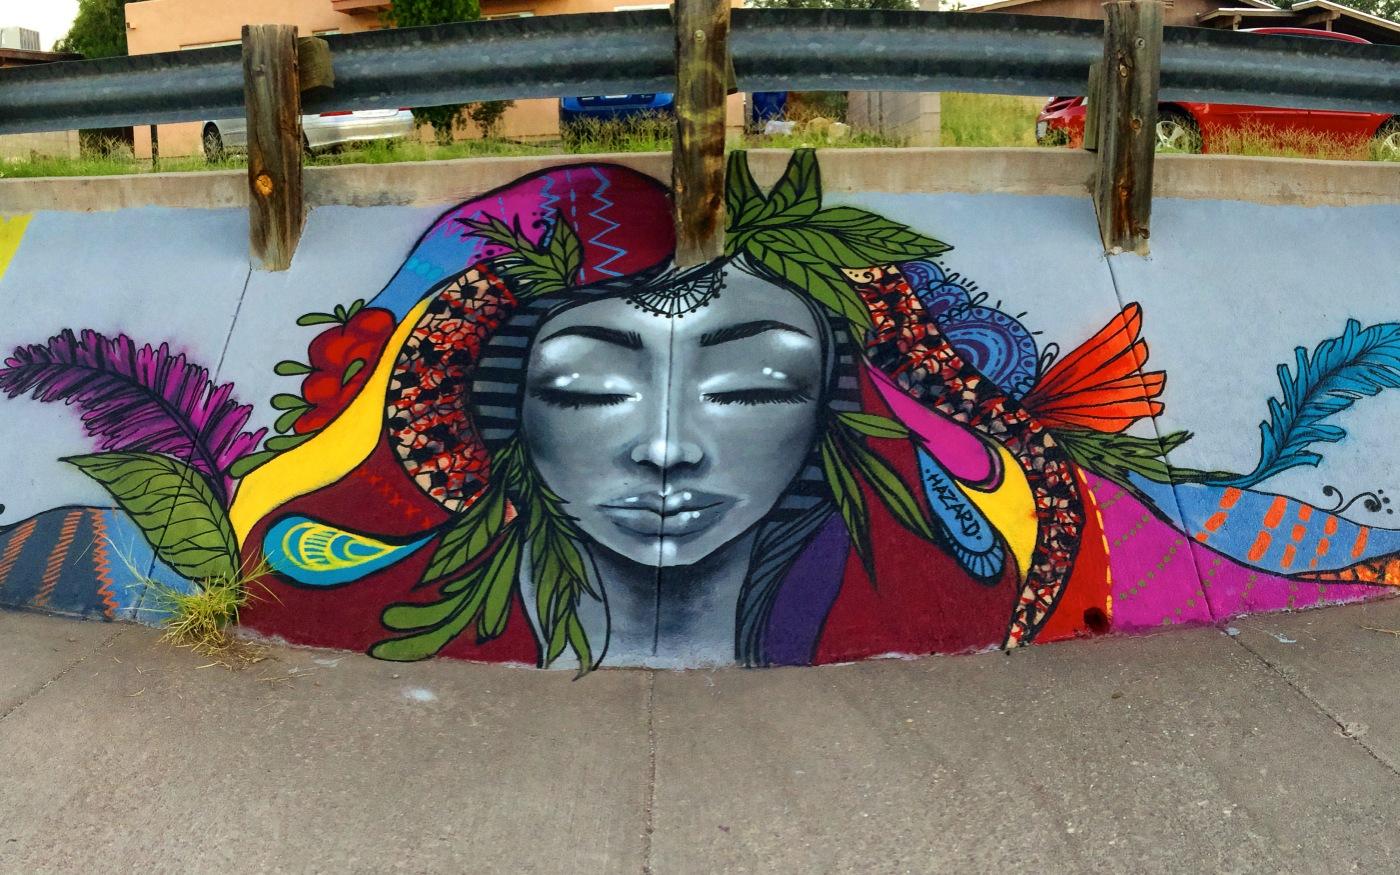 Graffiti art on wood - Interview With Street Artist Harriet Wood Aka Miss Hazard